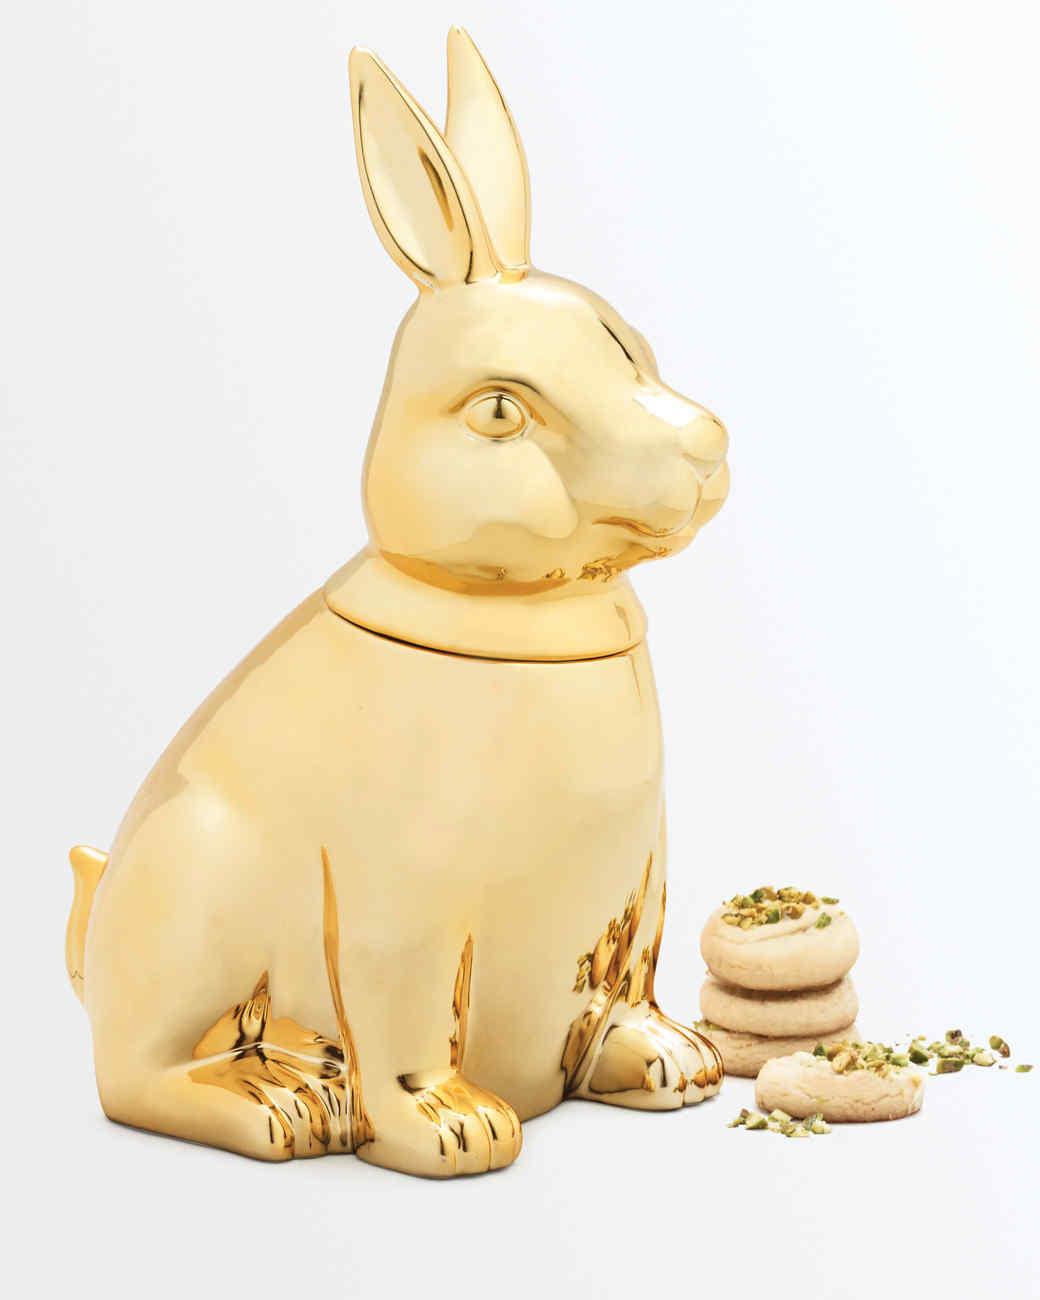 macys gold cookie jar bunny